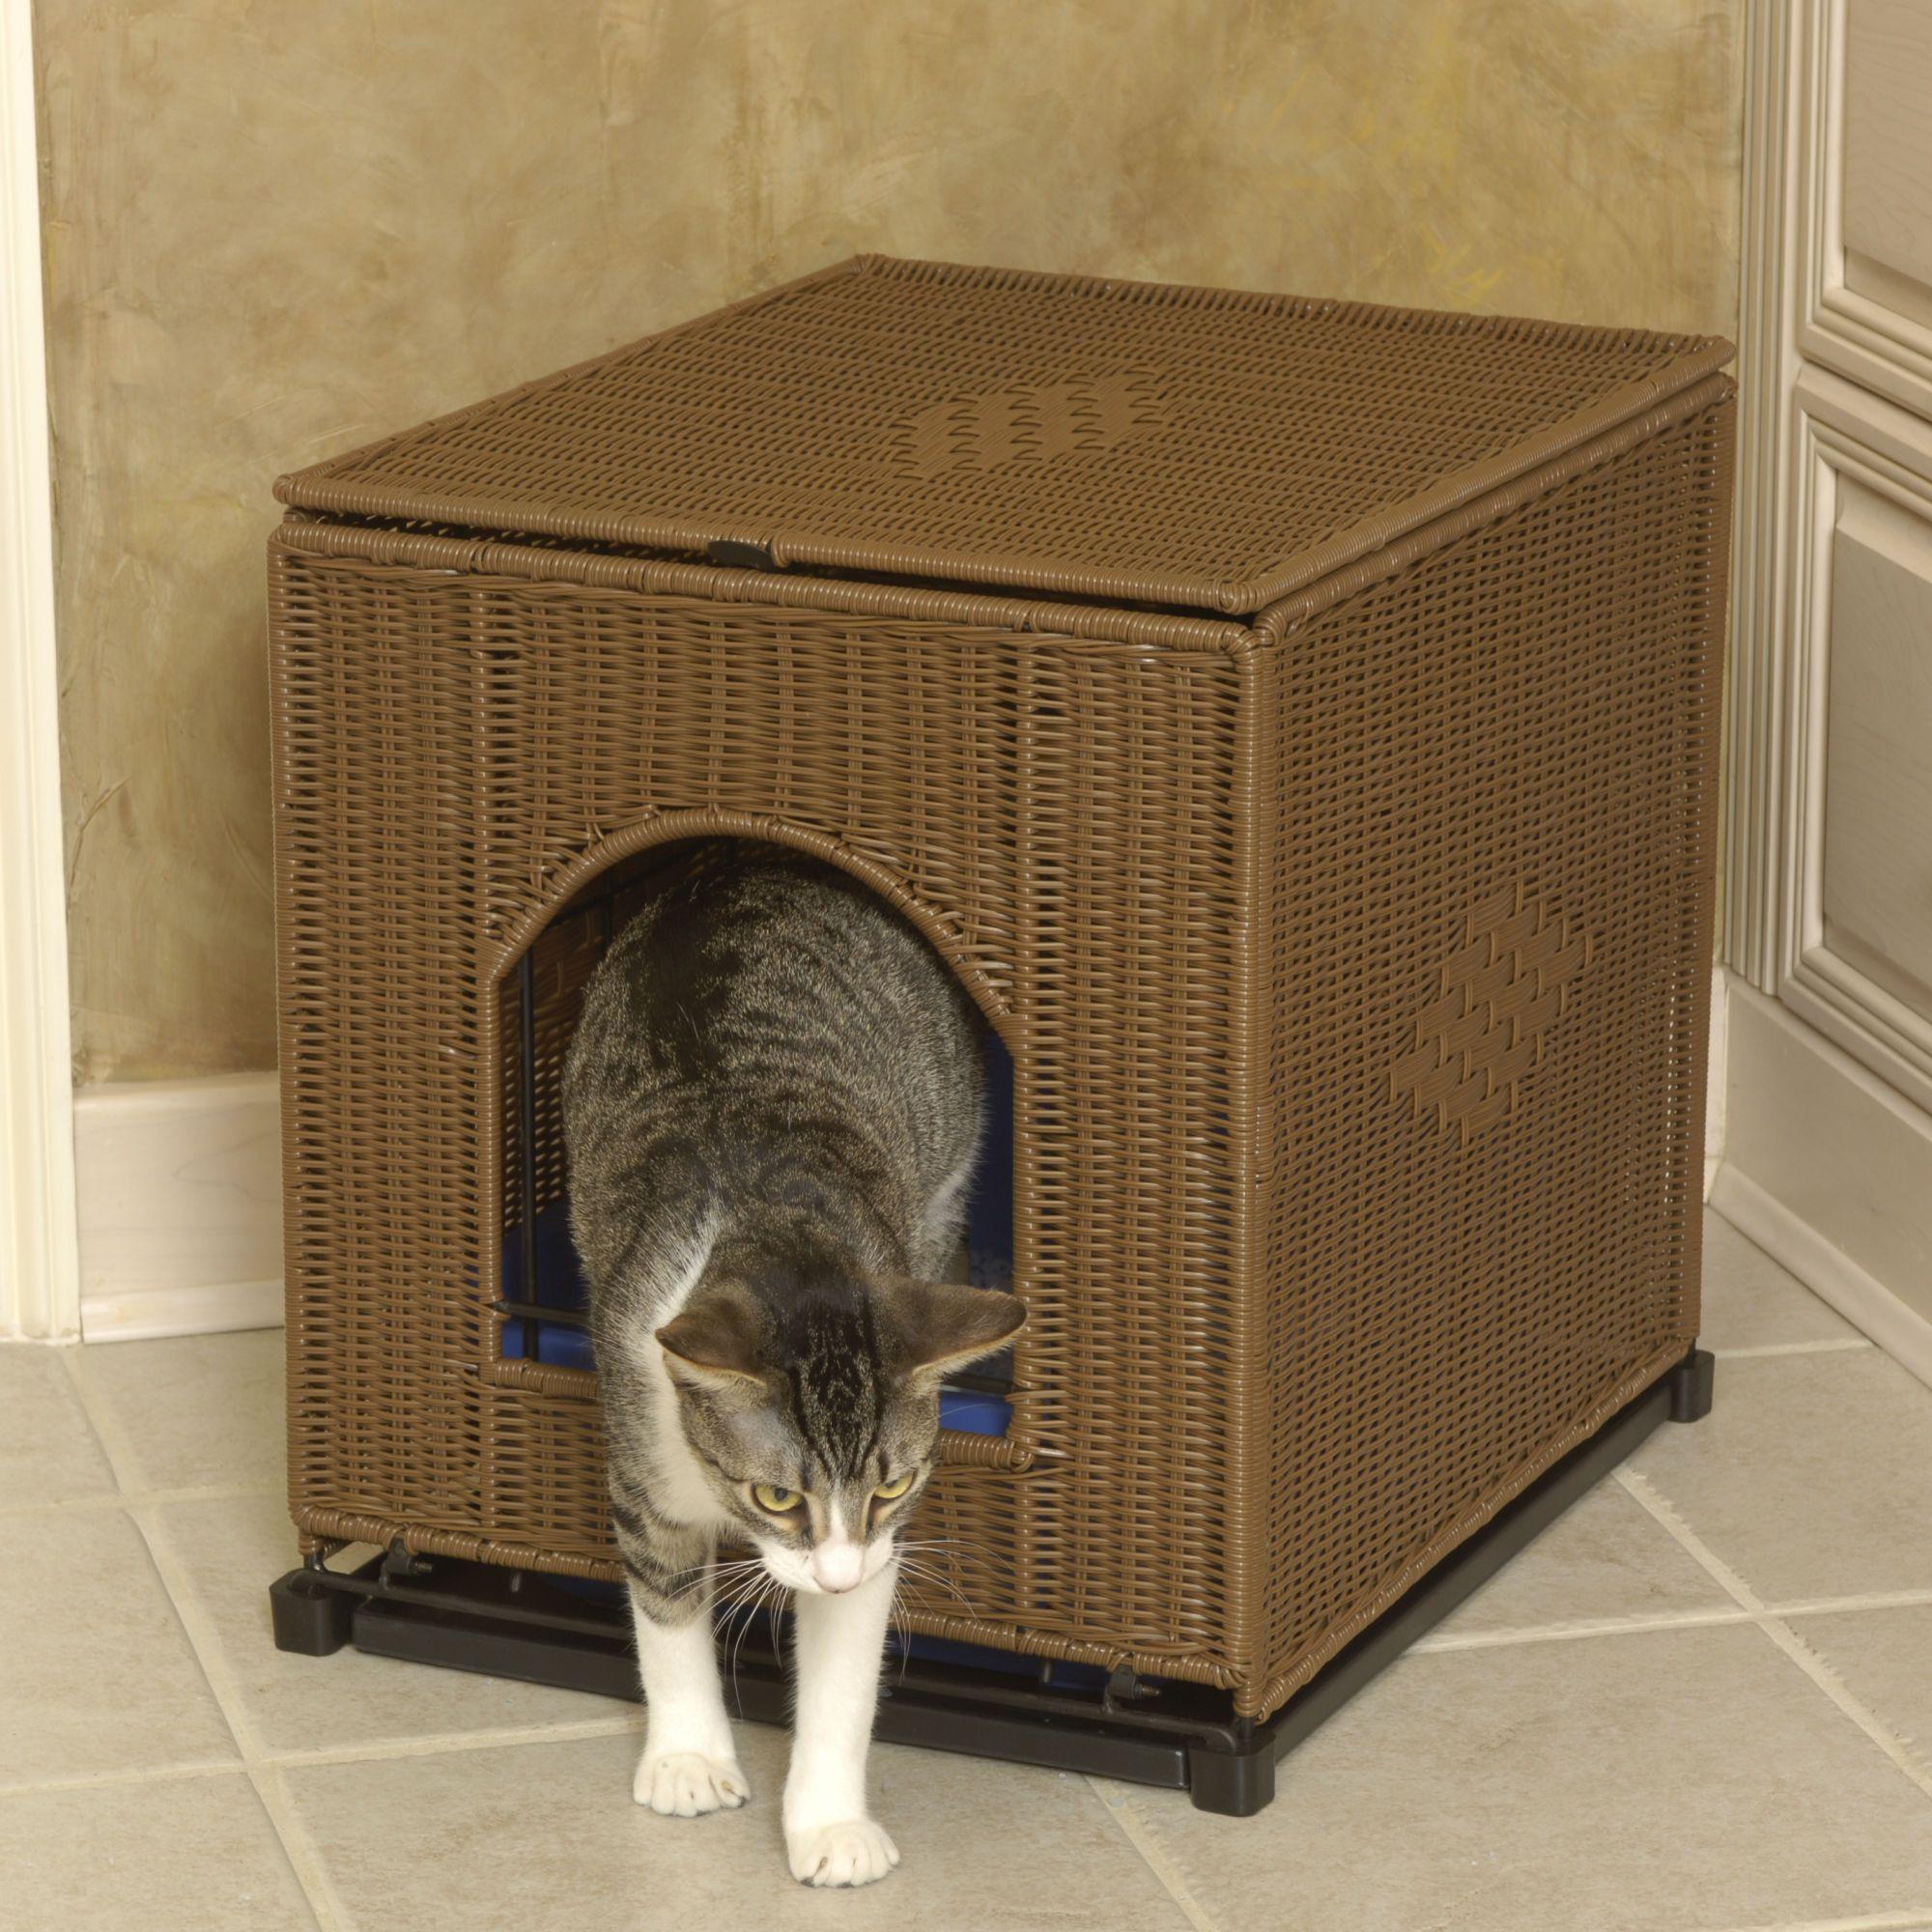 Decorative Litter Box: Mr. Herzher's Litter Box Cover